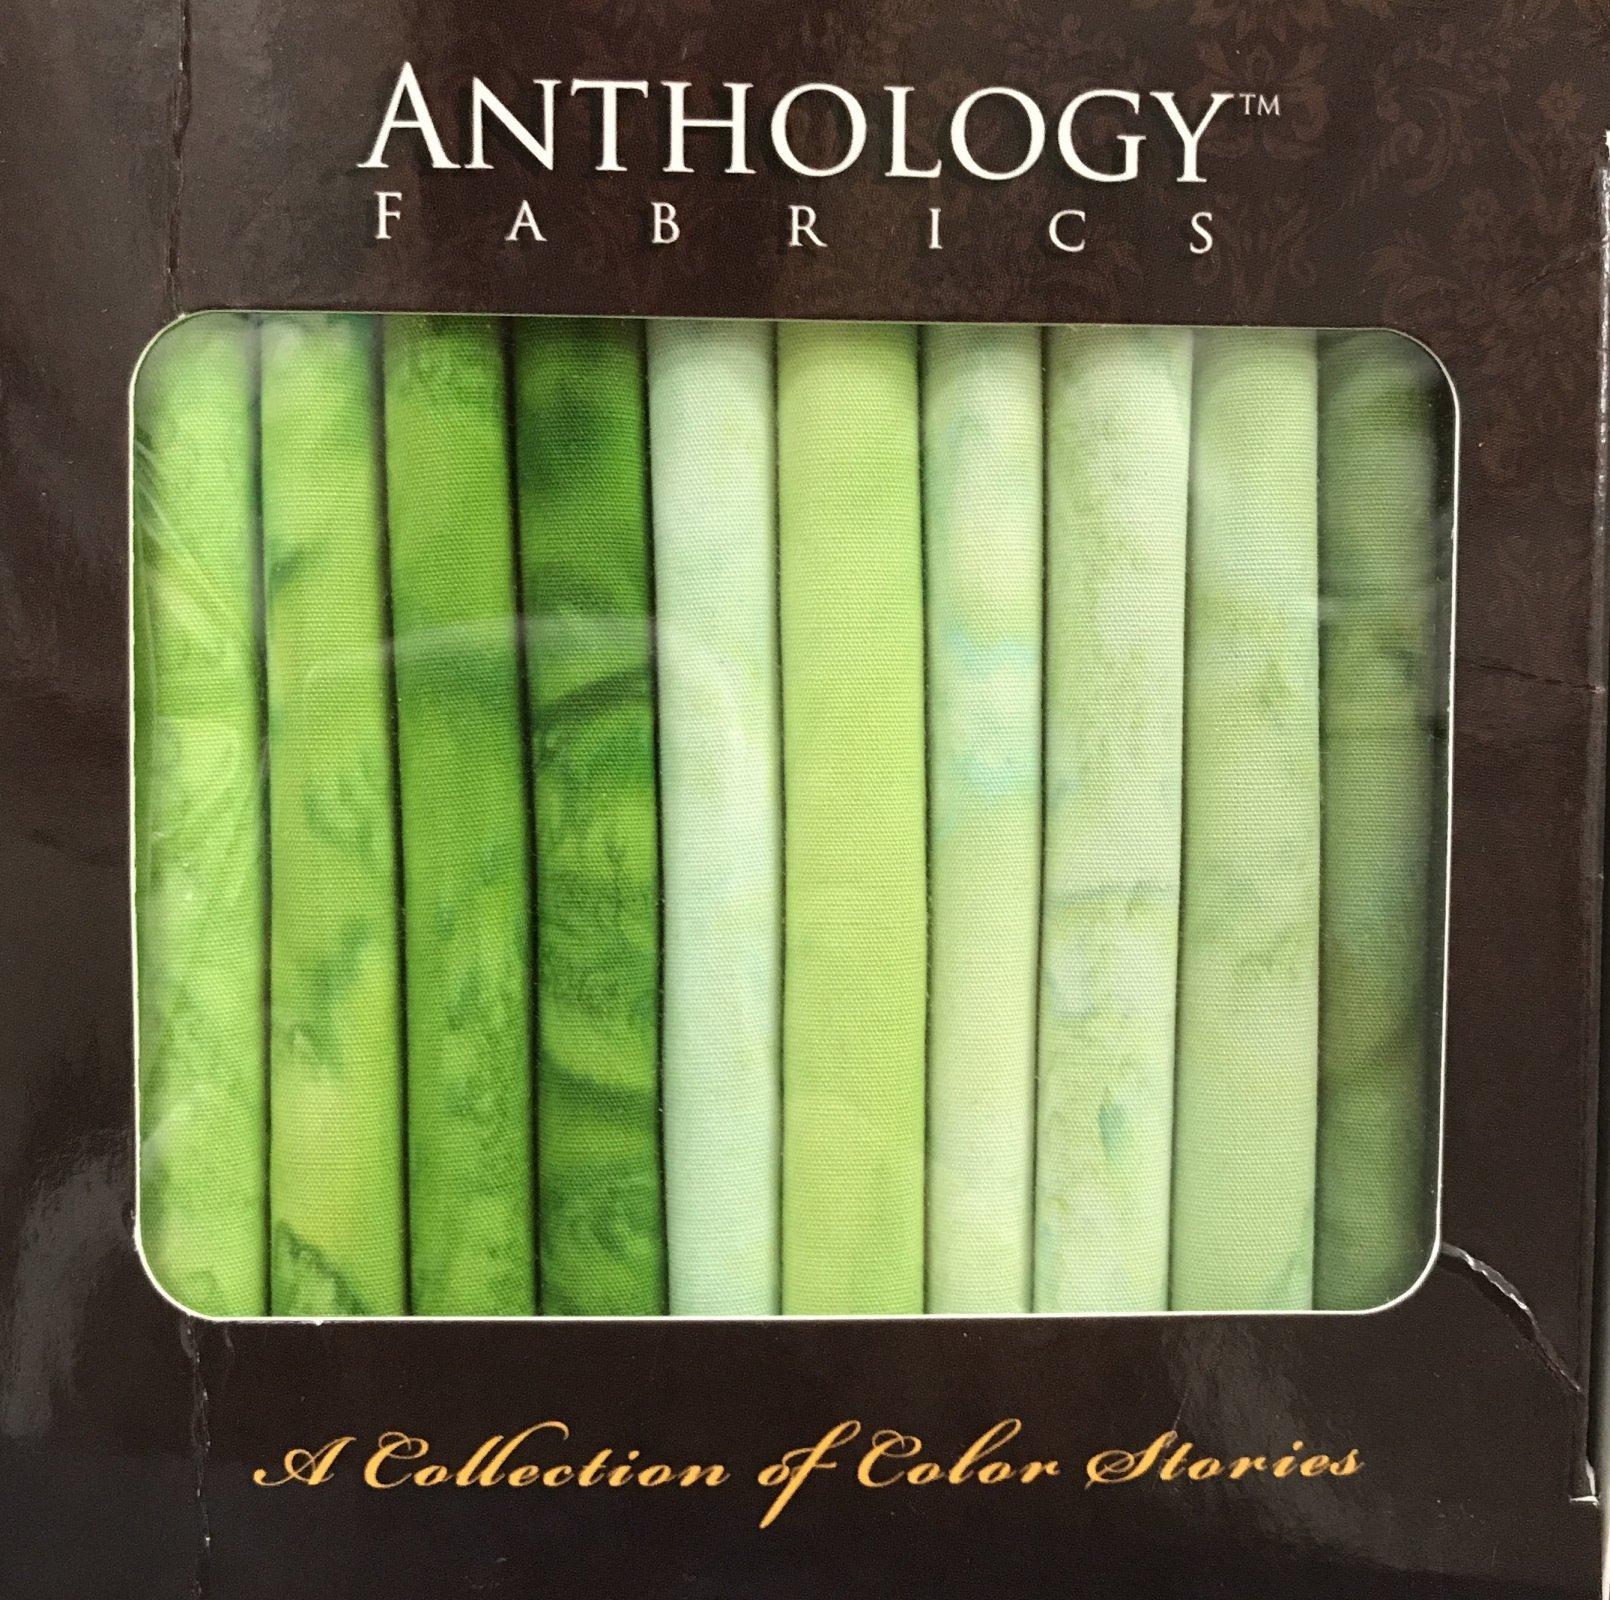 Anthology Batik Bundle Boxes - Greens